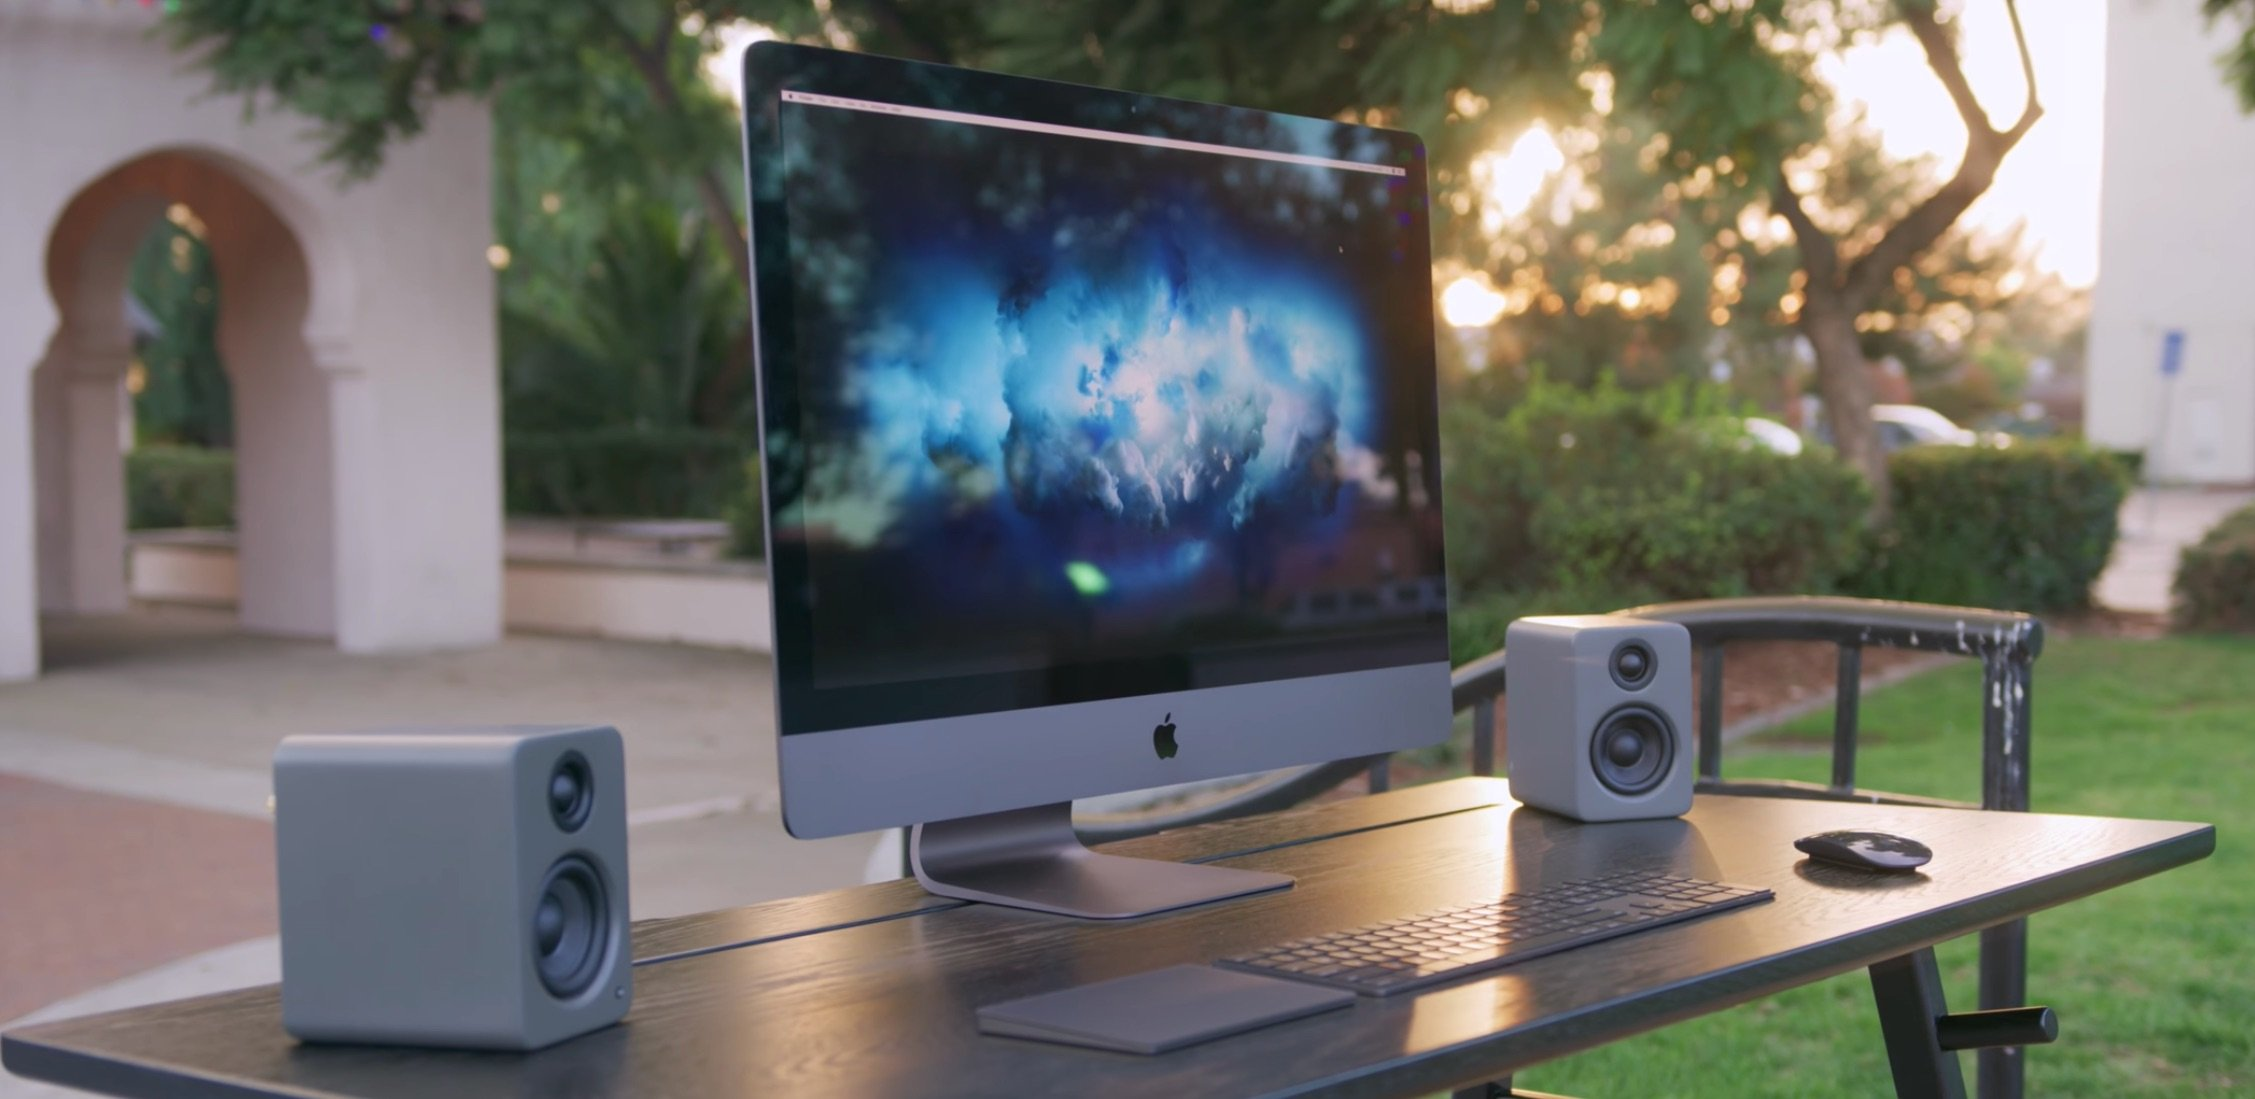 iMac Pro ab 14.Dez bestellen: 18-Core Xeon CPU, 128GB RAM, Radeon Pro Vega GPU 1